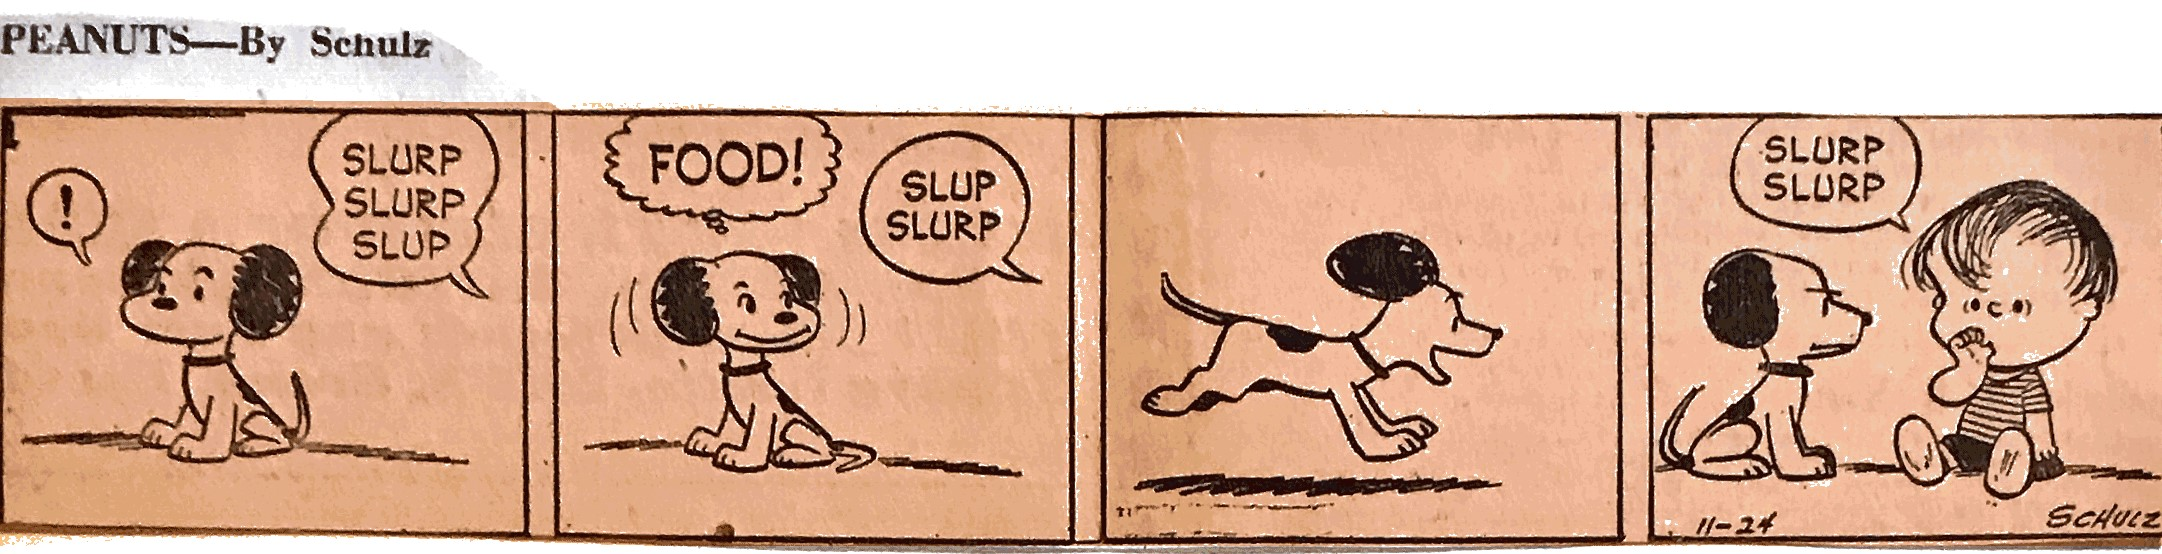 10. Nov. 24, 1952 (Oma)_Page_6.jpg